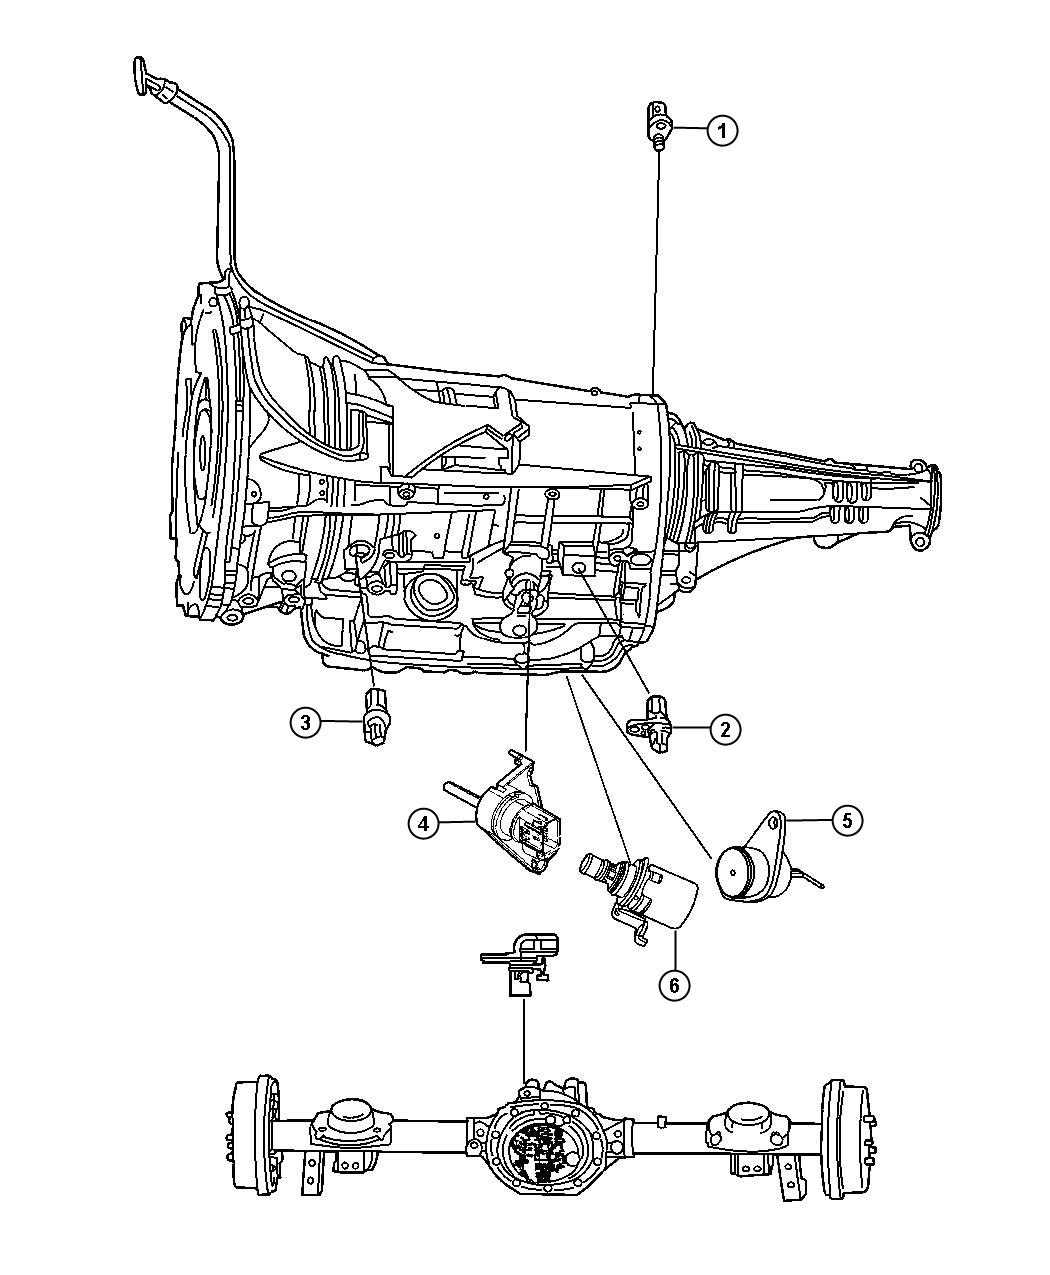 Dodge Ram 1500 Sensor. Manual valve lever. Trans range